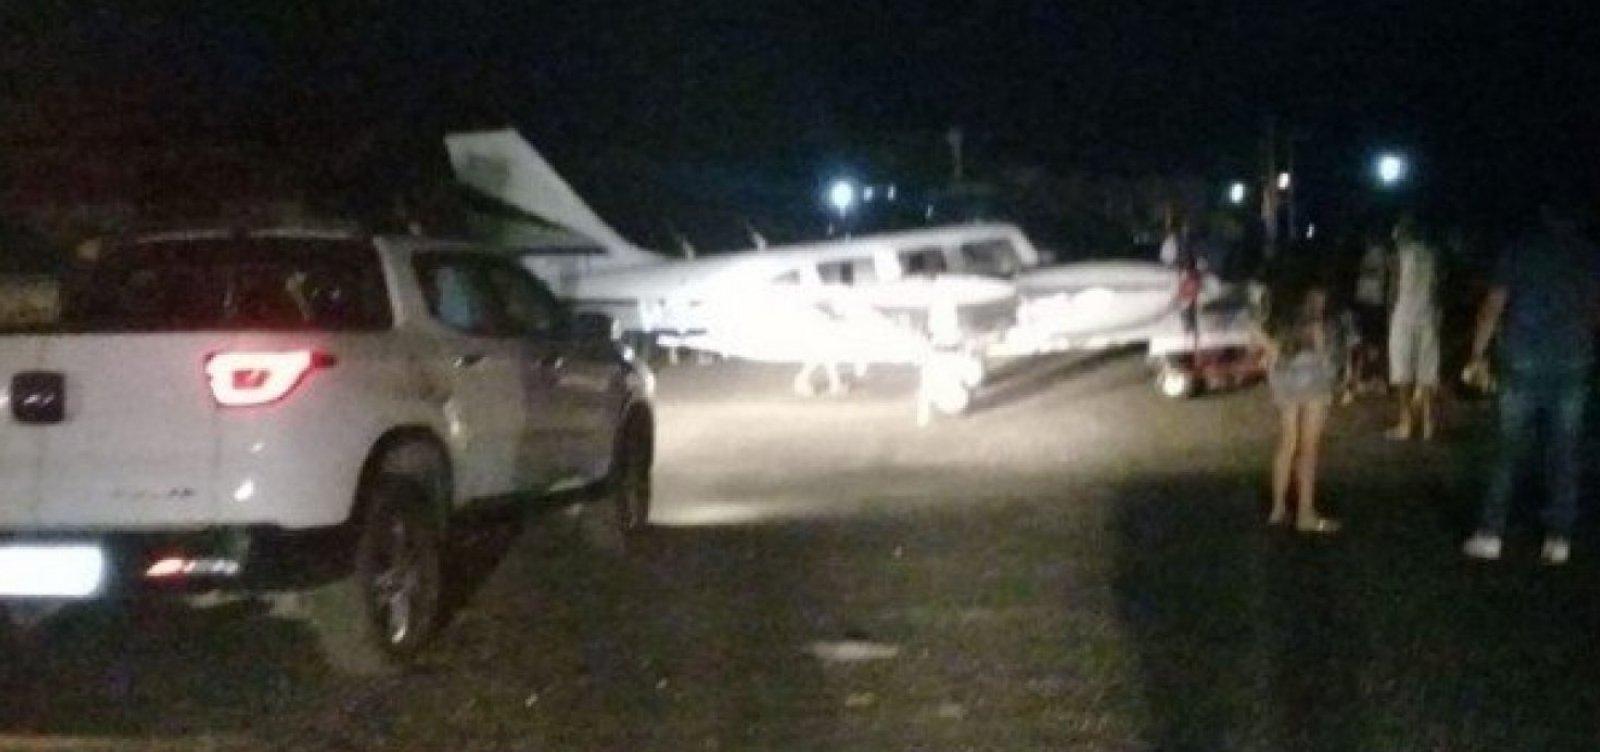 Anac vai investigar pouso de avião que levava Amado Batista